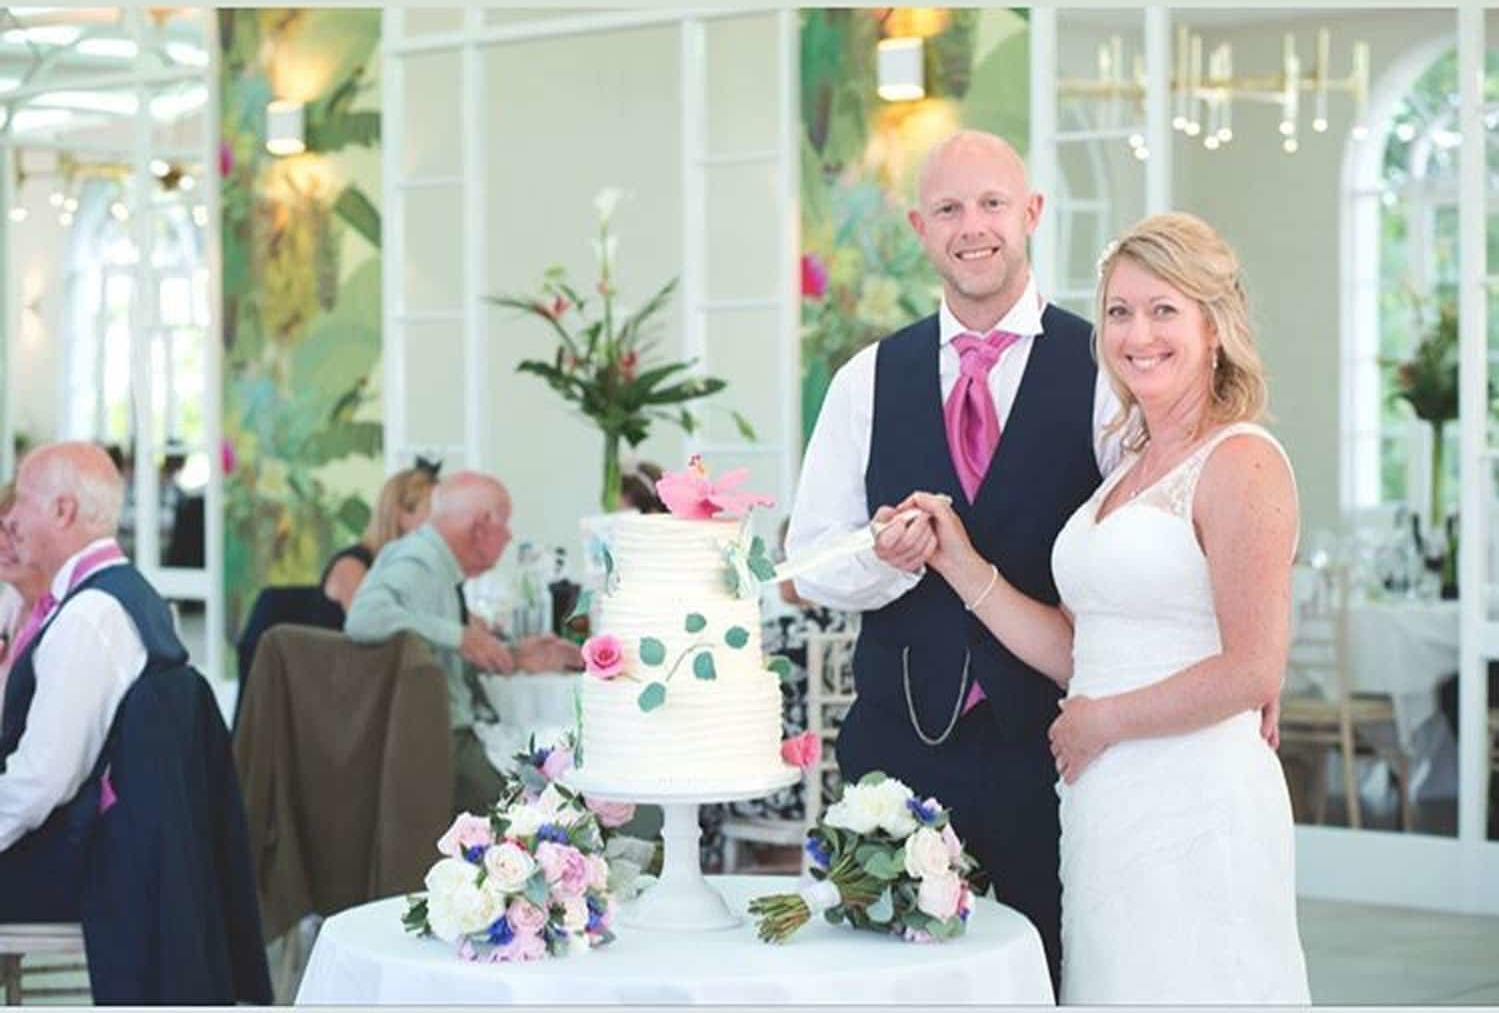 wedding cakes 6 fun facts